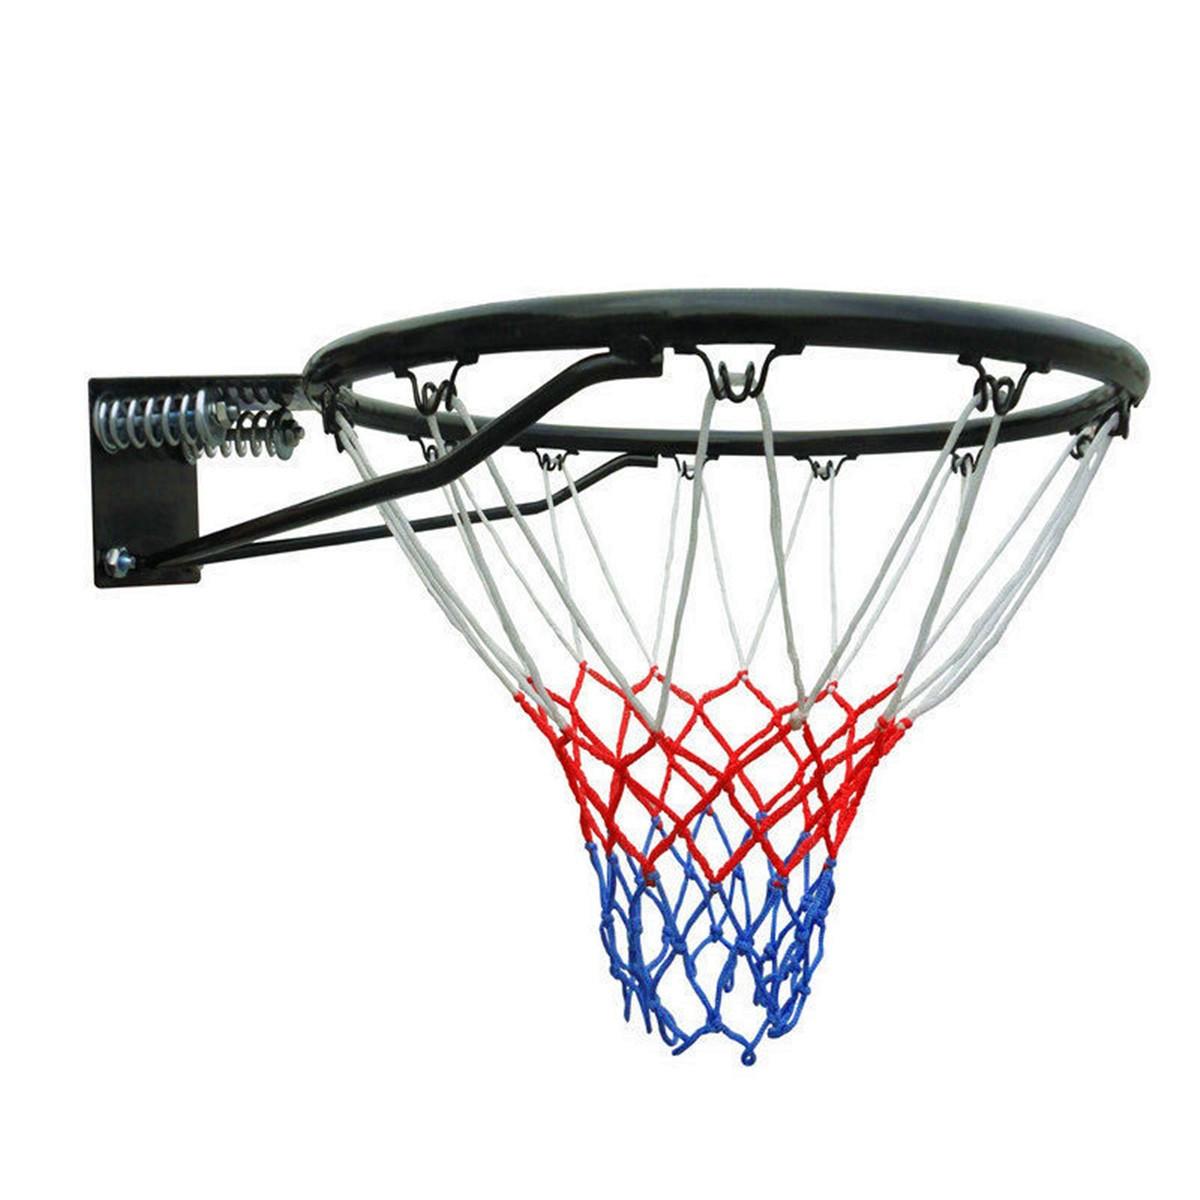 Universal Sports 6mm Nylon Thread Basketball Hoop Goal Rim Net Replacement Mesh